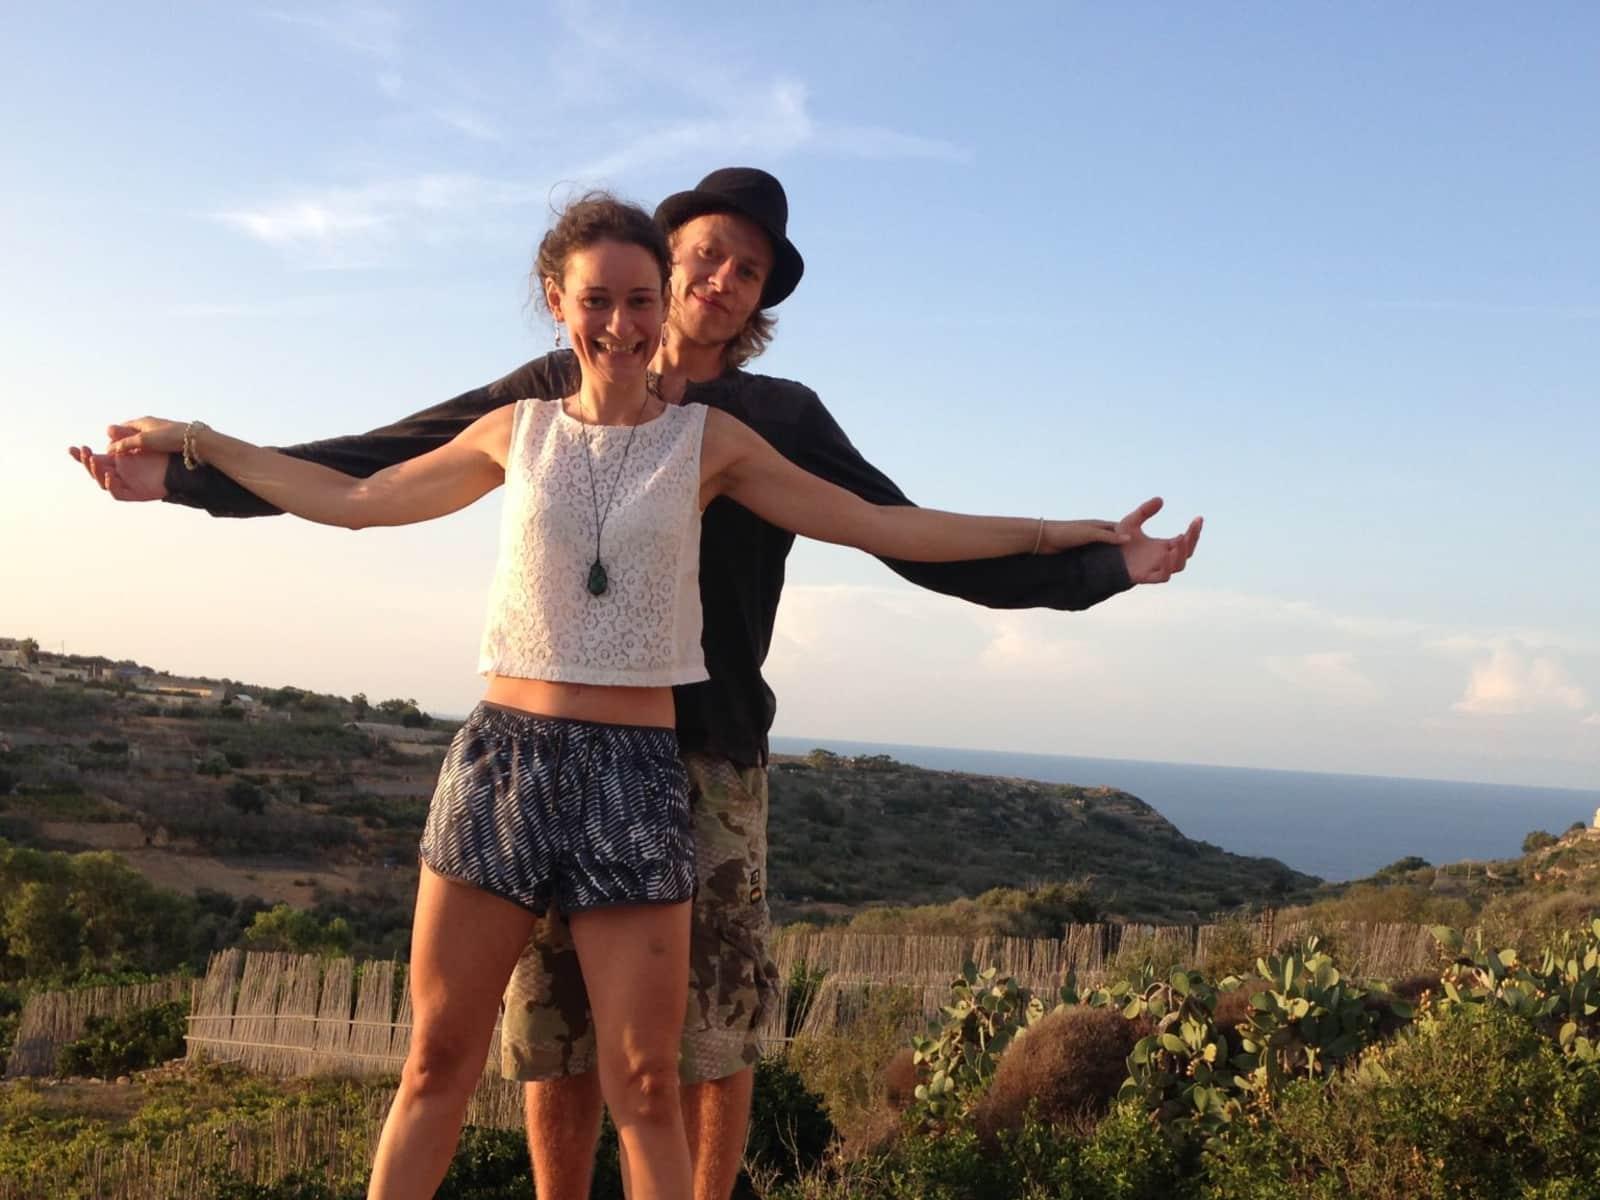 Renata & chris & Chris from London, United Kingdom